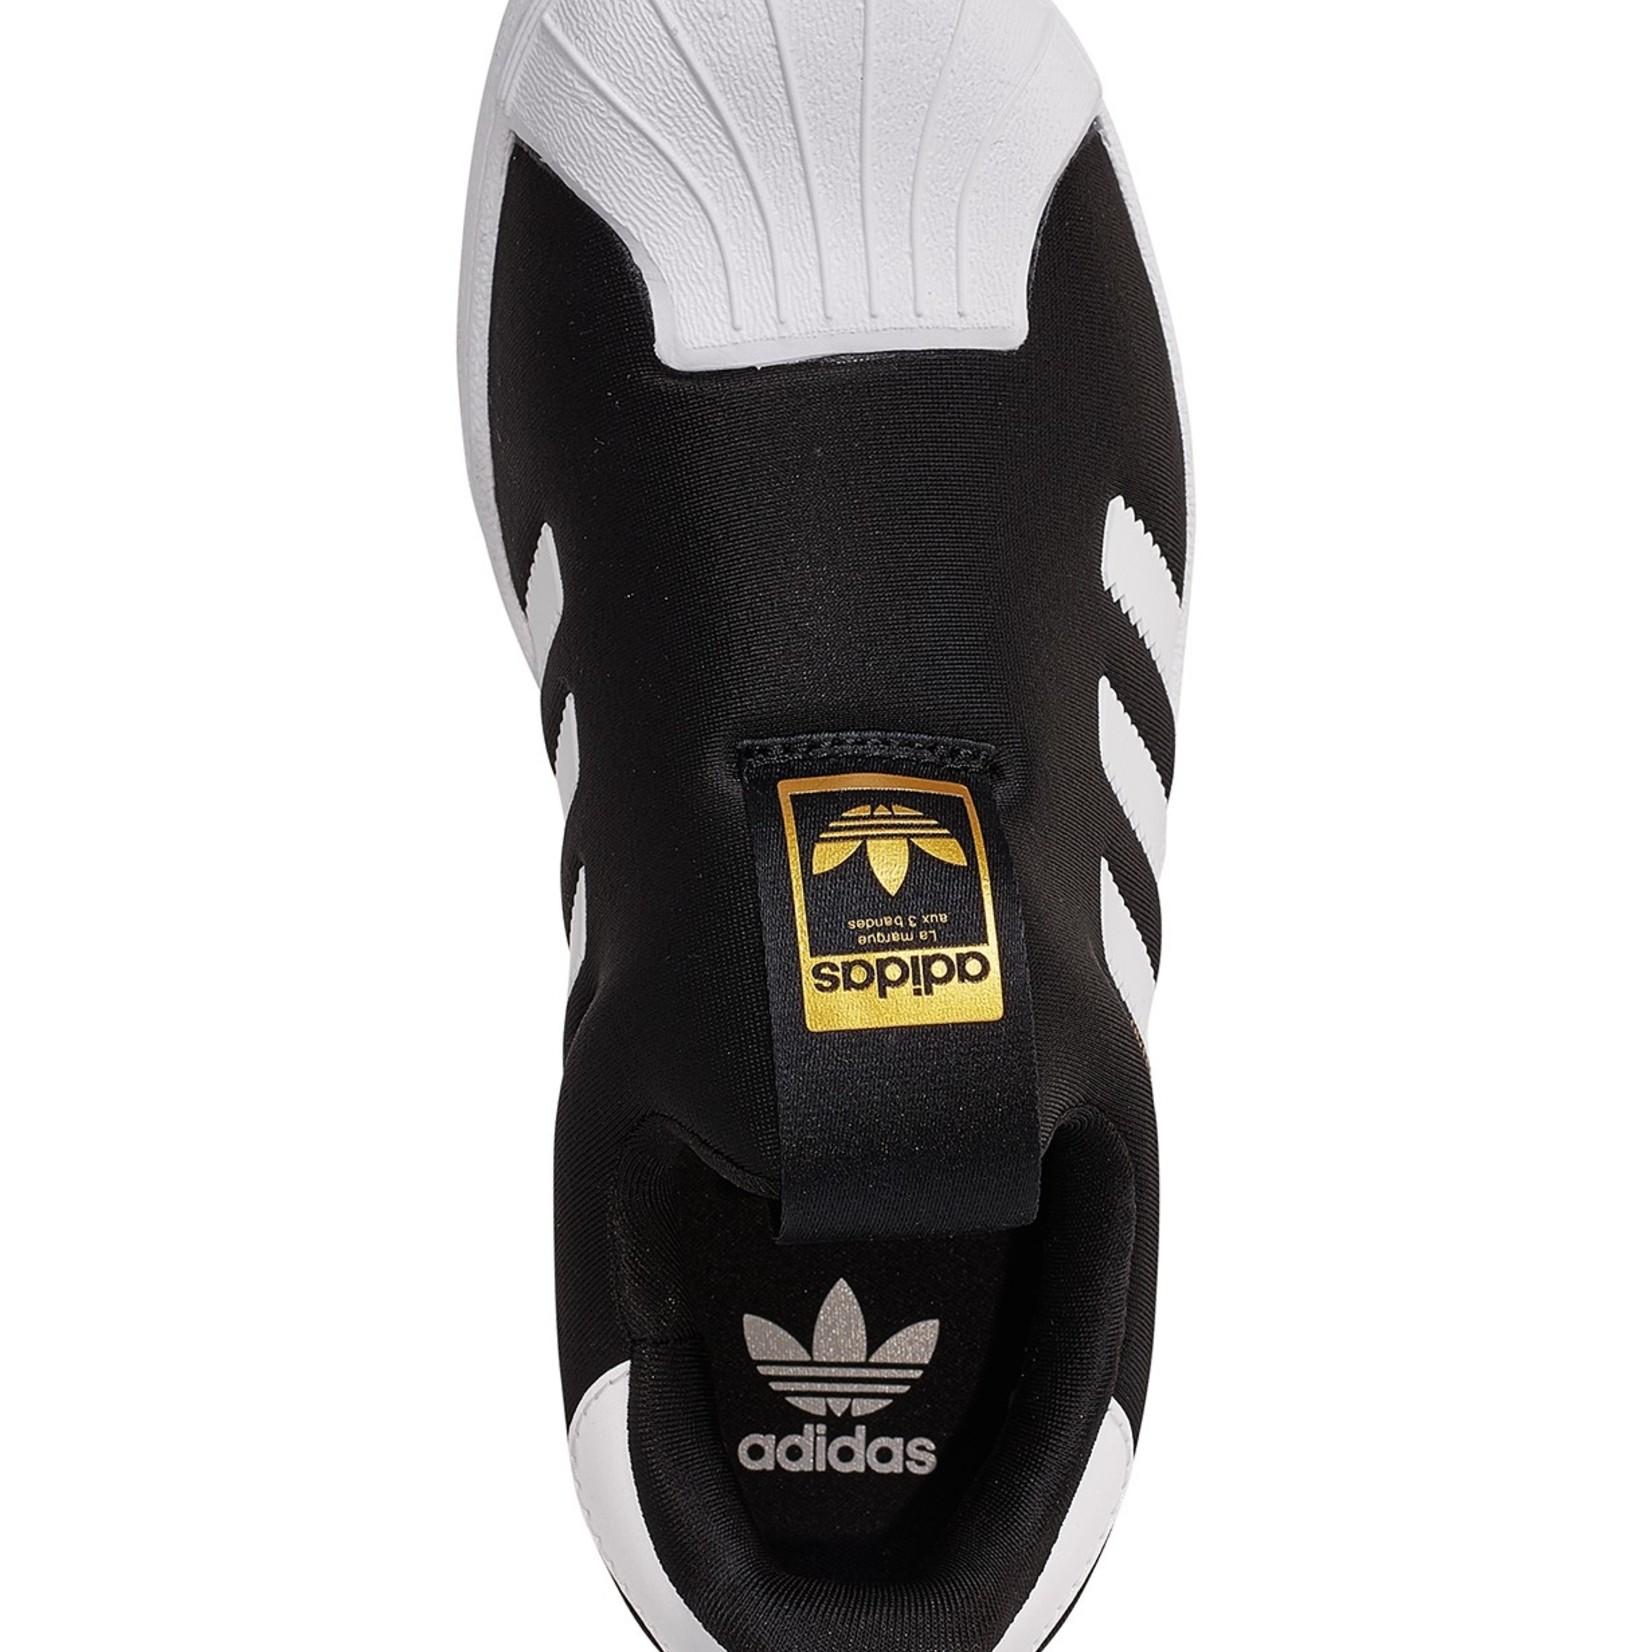 Adidas Adidas Kids Superstar 360